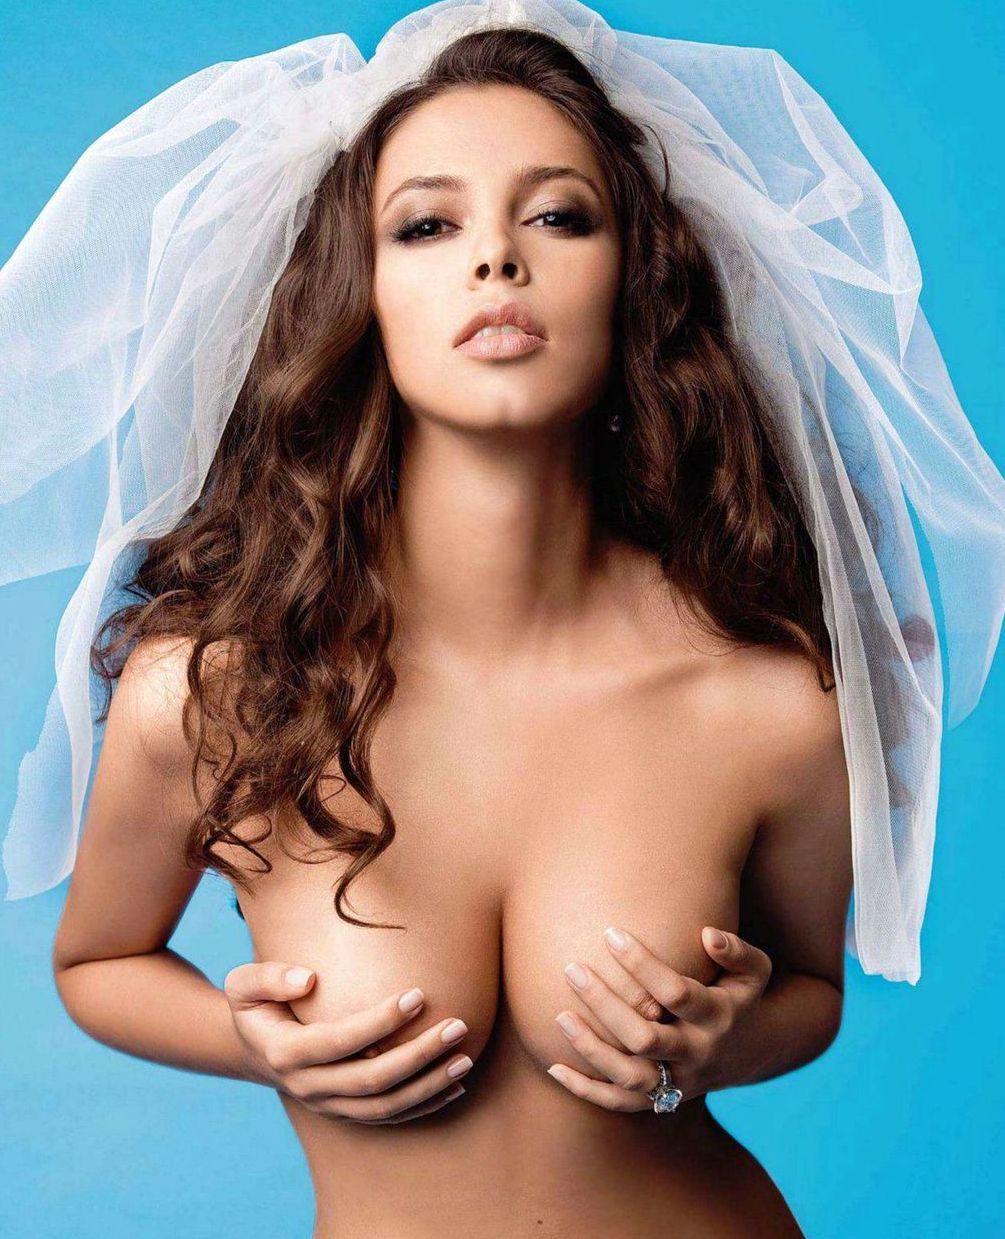 Sexy hot boobs tits